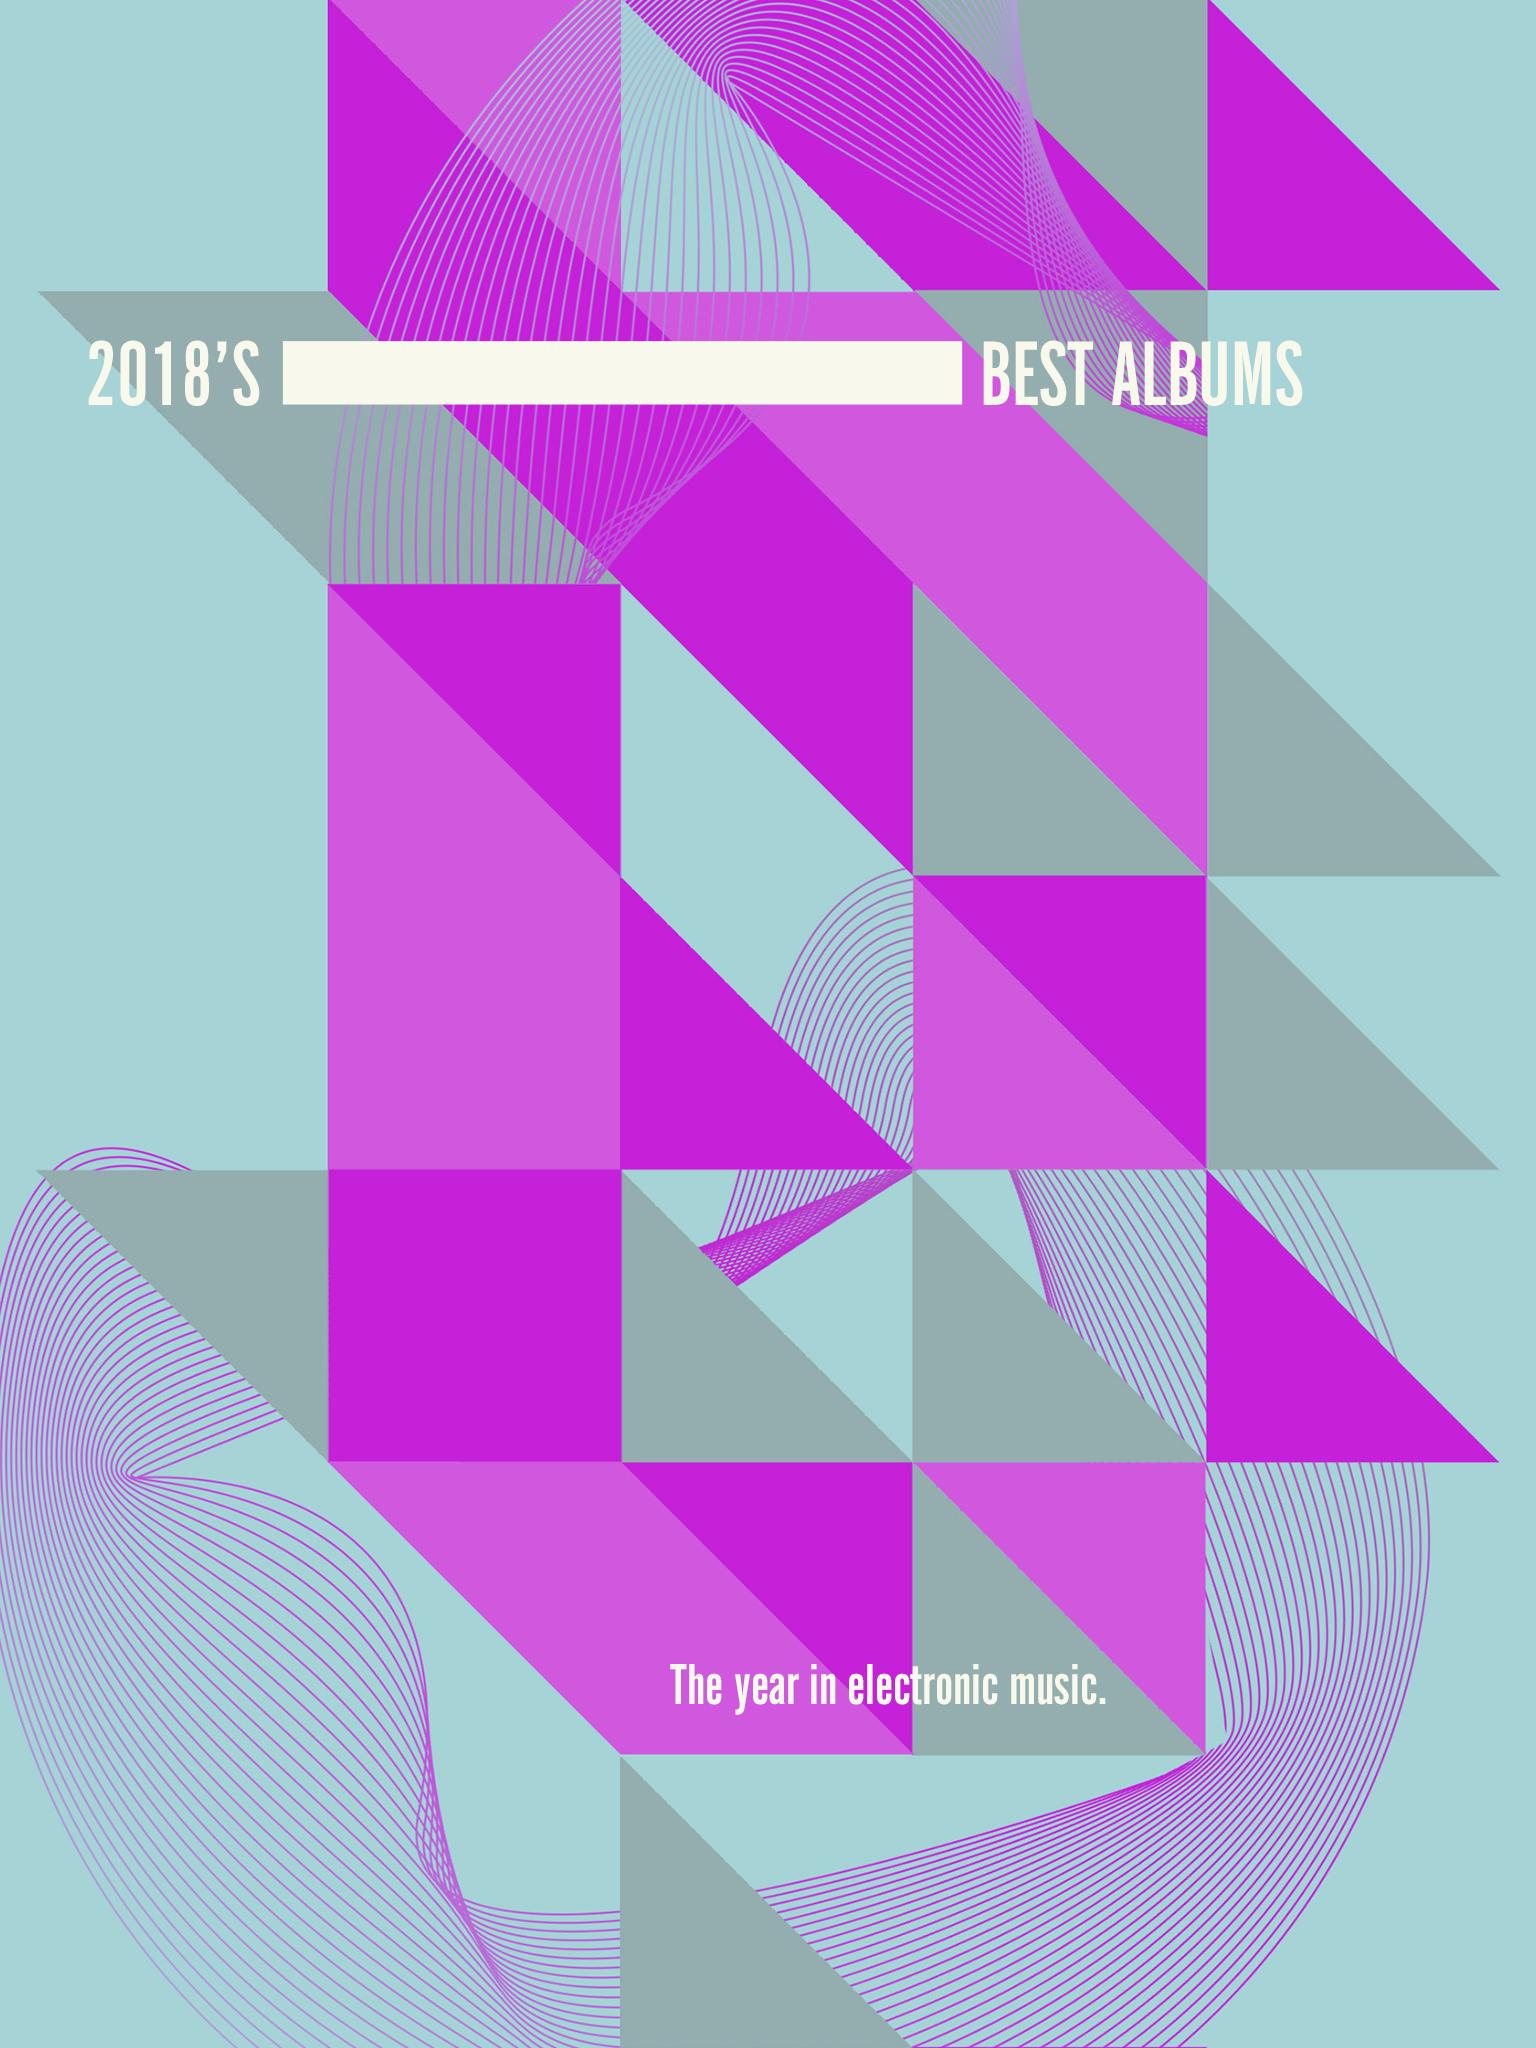 2018's Best Albums